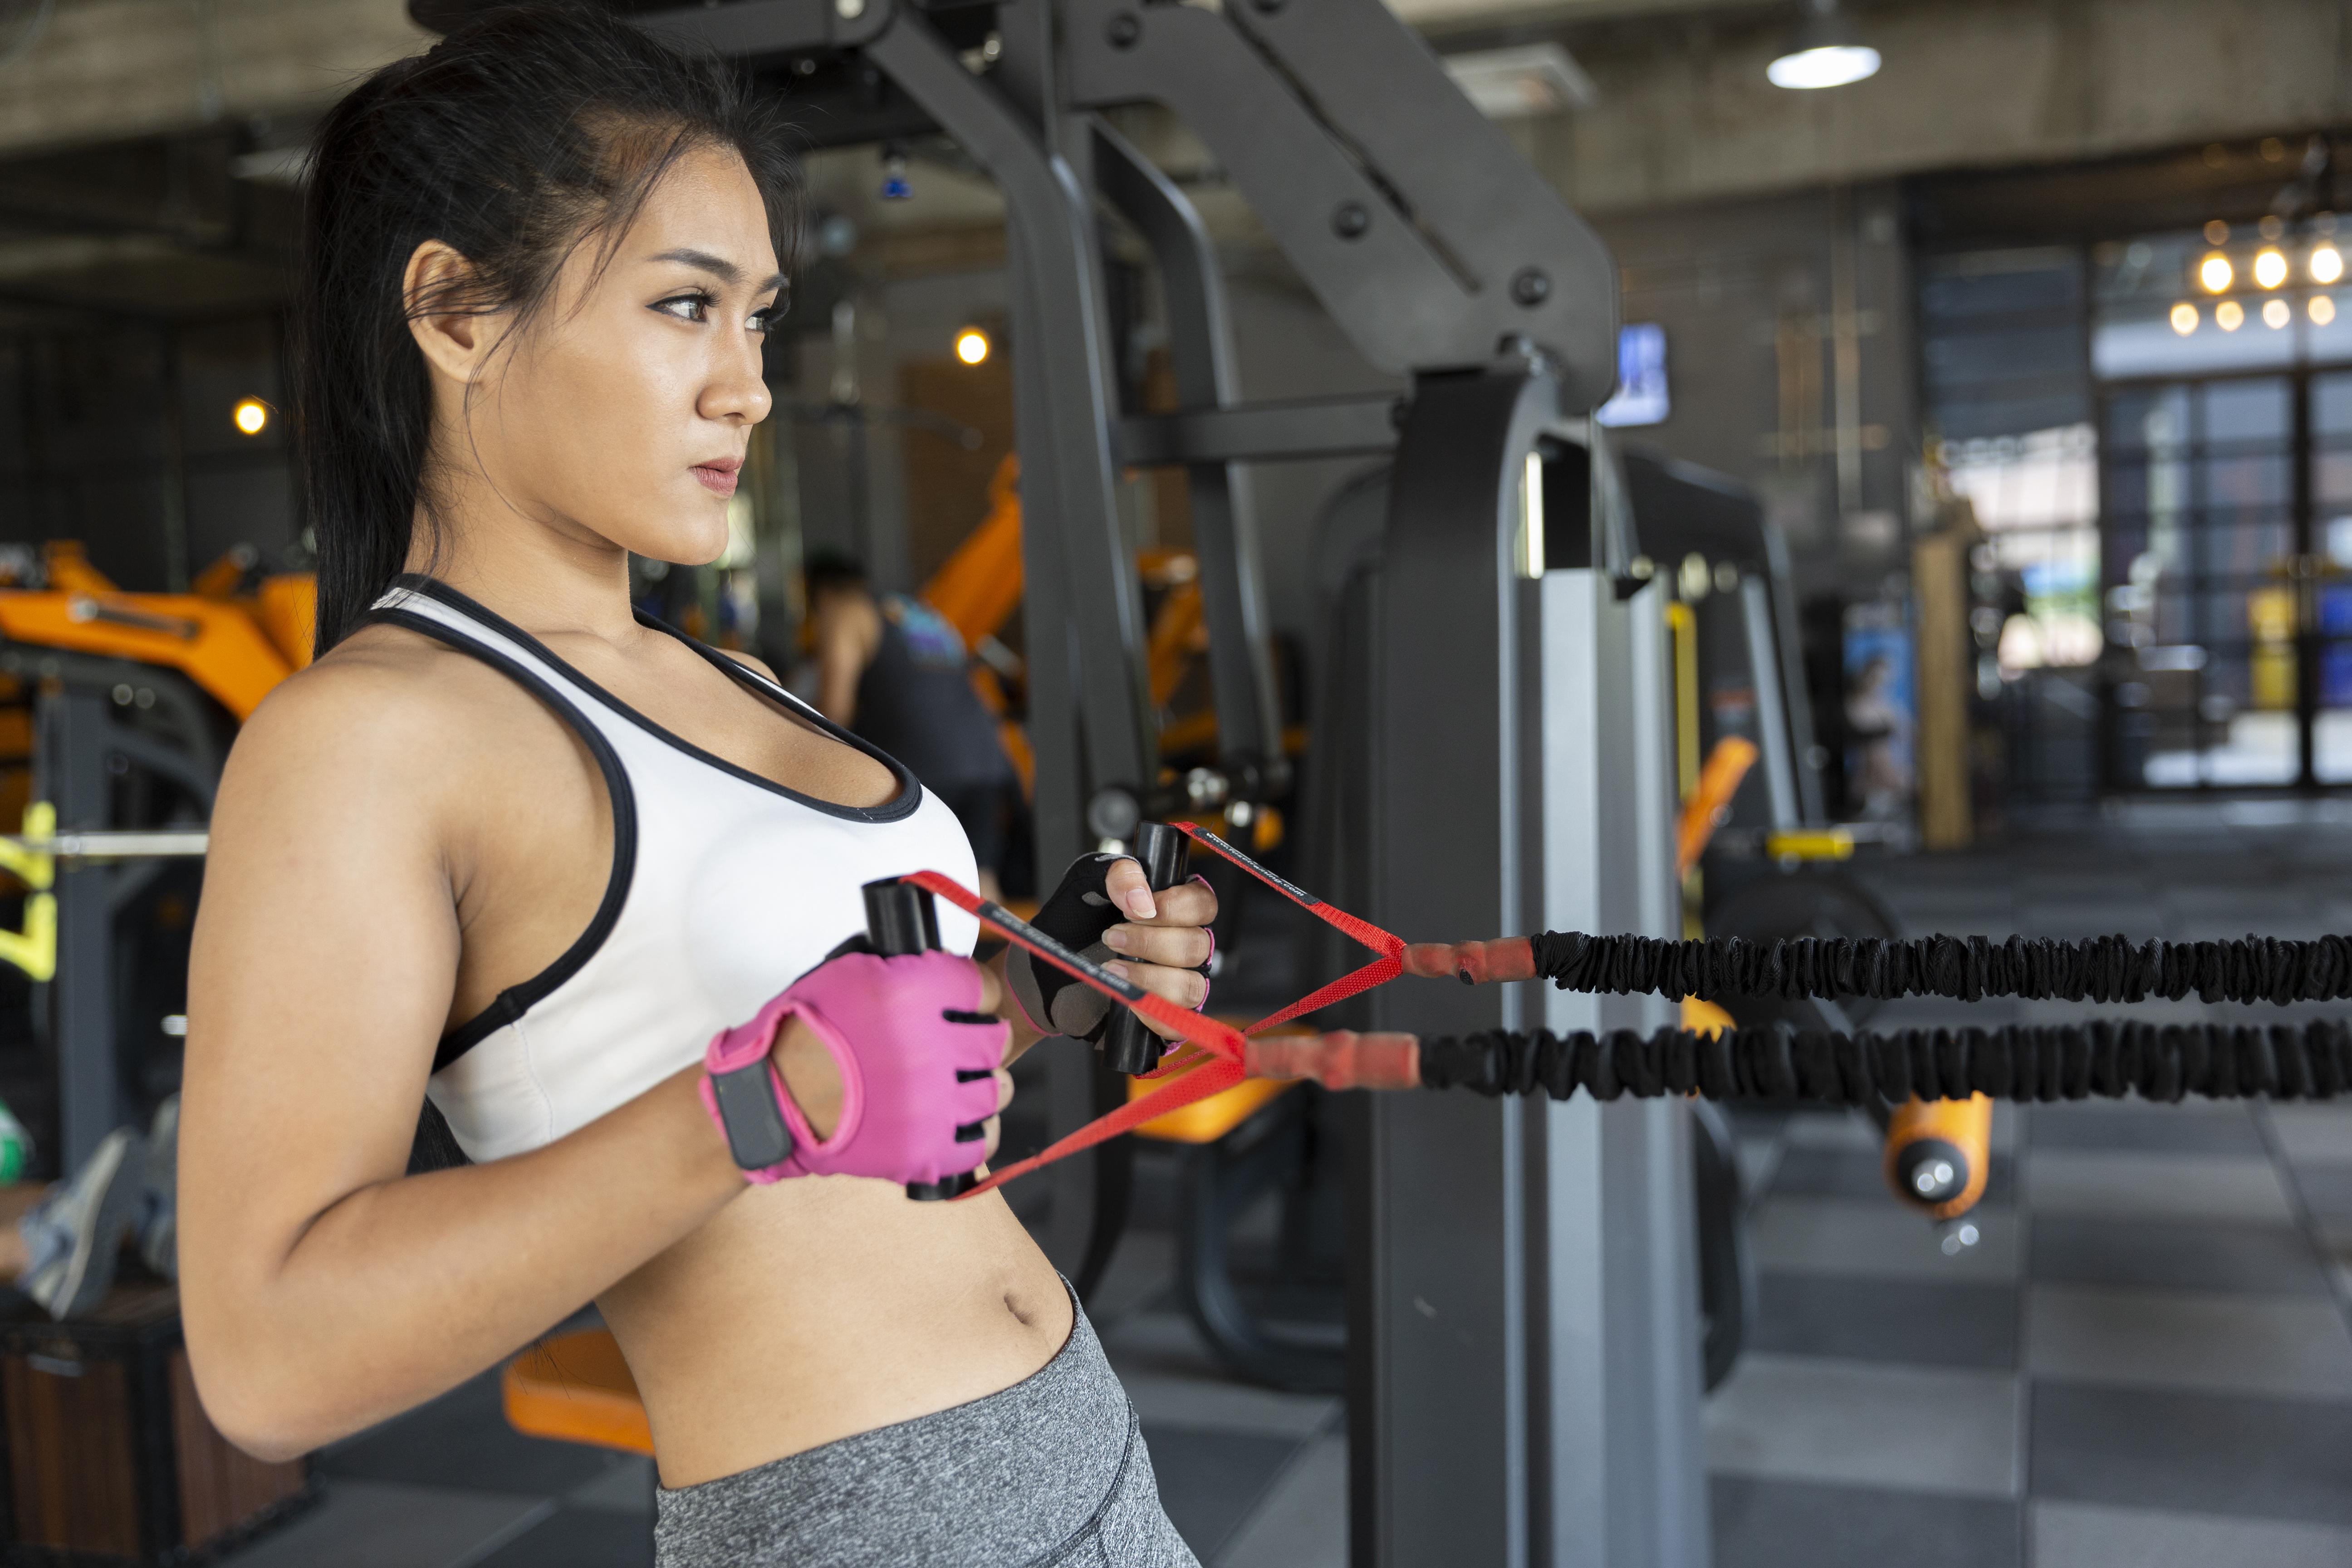 Treino funcional SJC: moça se exercitando